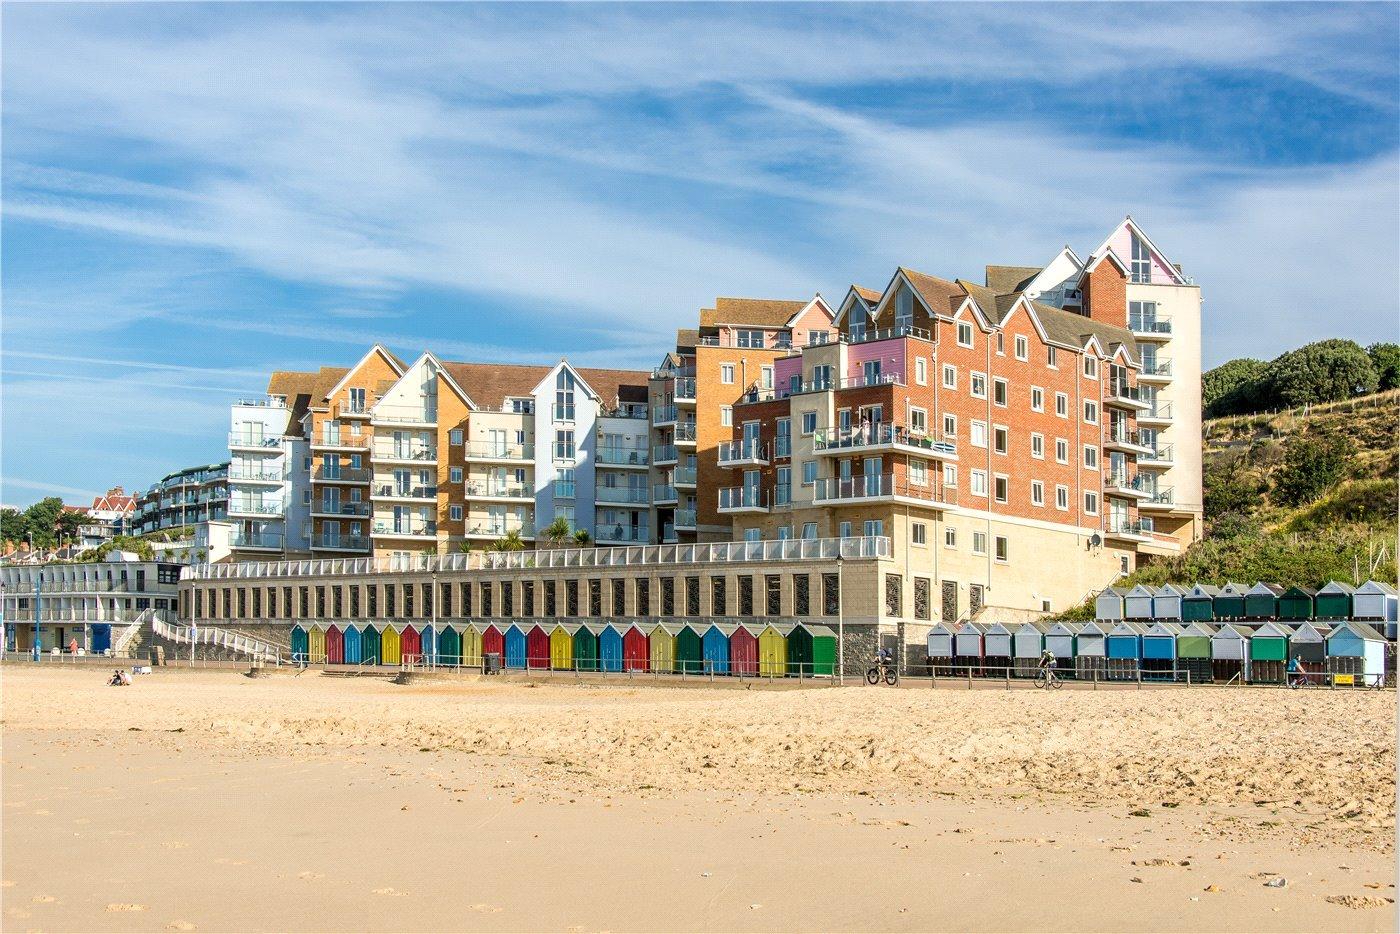 2 Bedroom Property To Rent In Honeycombe Beach Boscombe